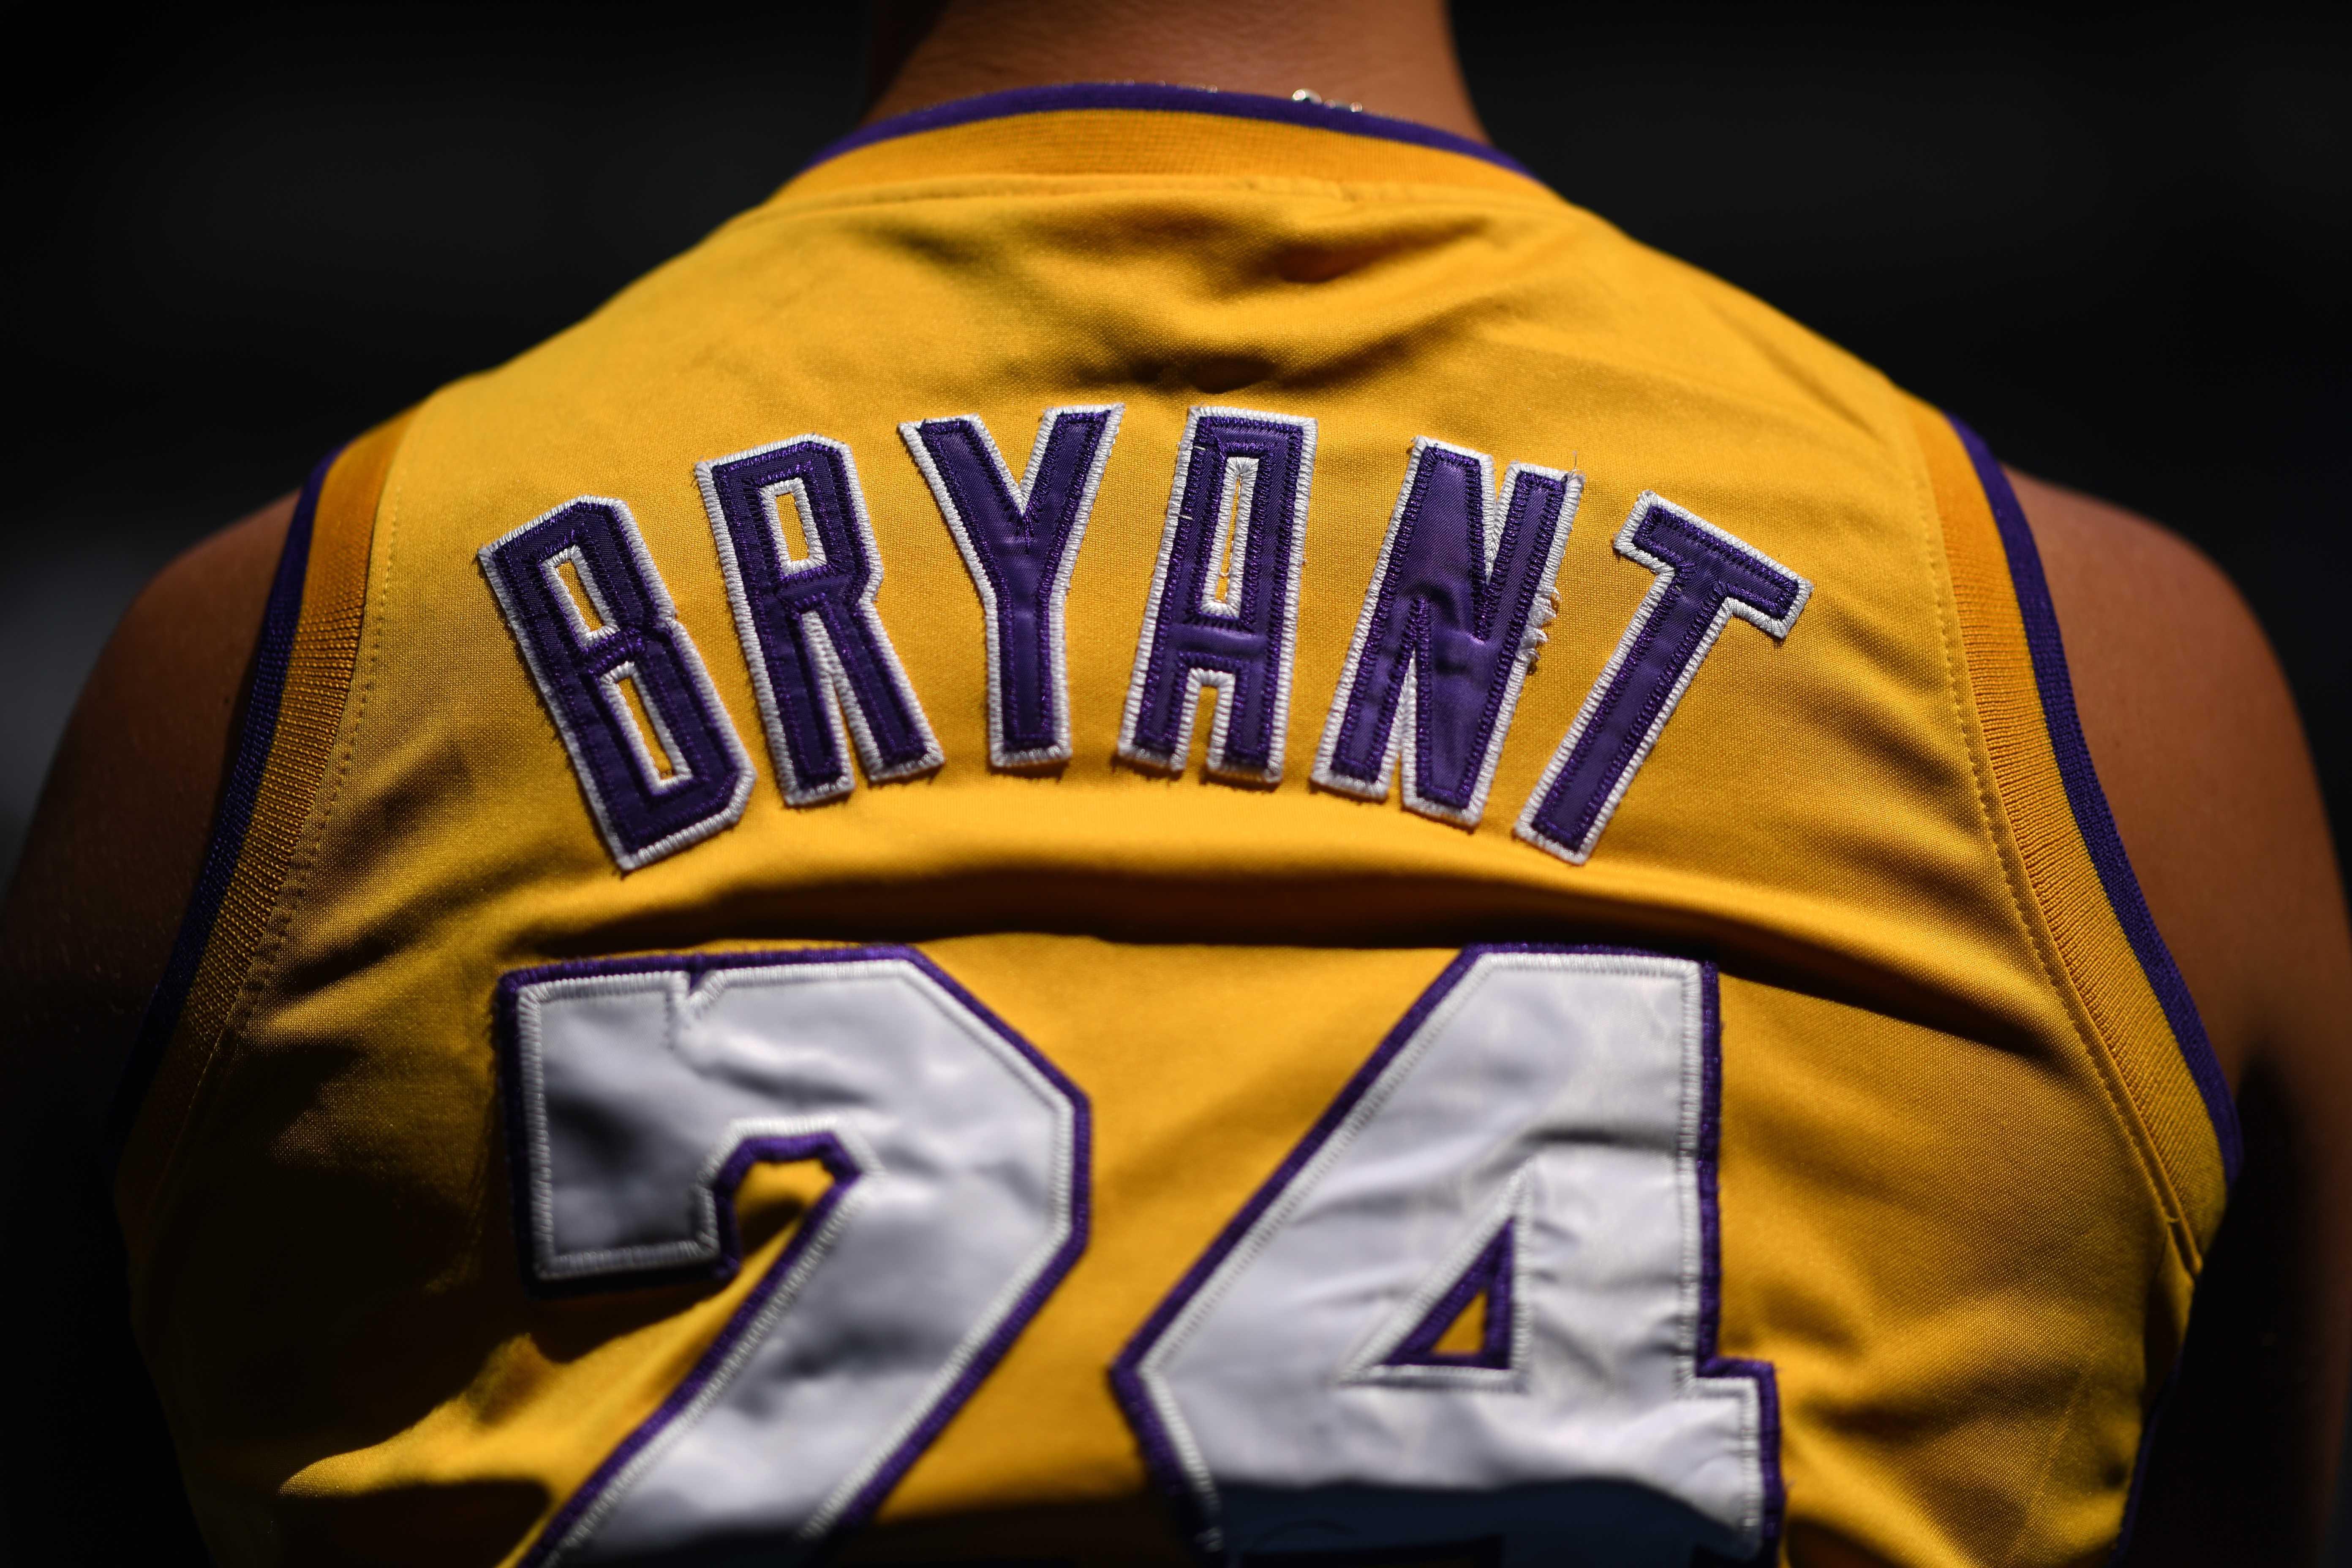 NBA+oyuncular%C4%B1n%C4%B1n+Kobe+Bryant+payla%C5%9F%C4%B1mlar%C4%B1